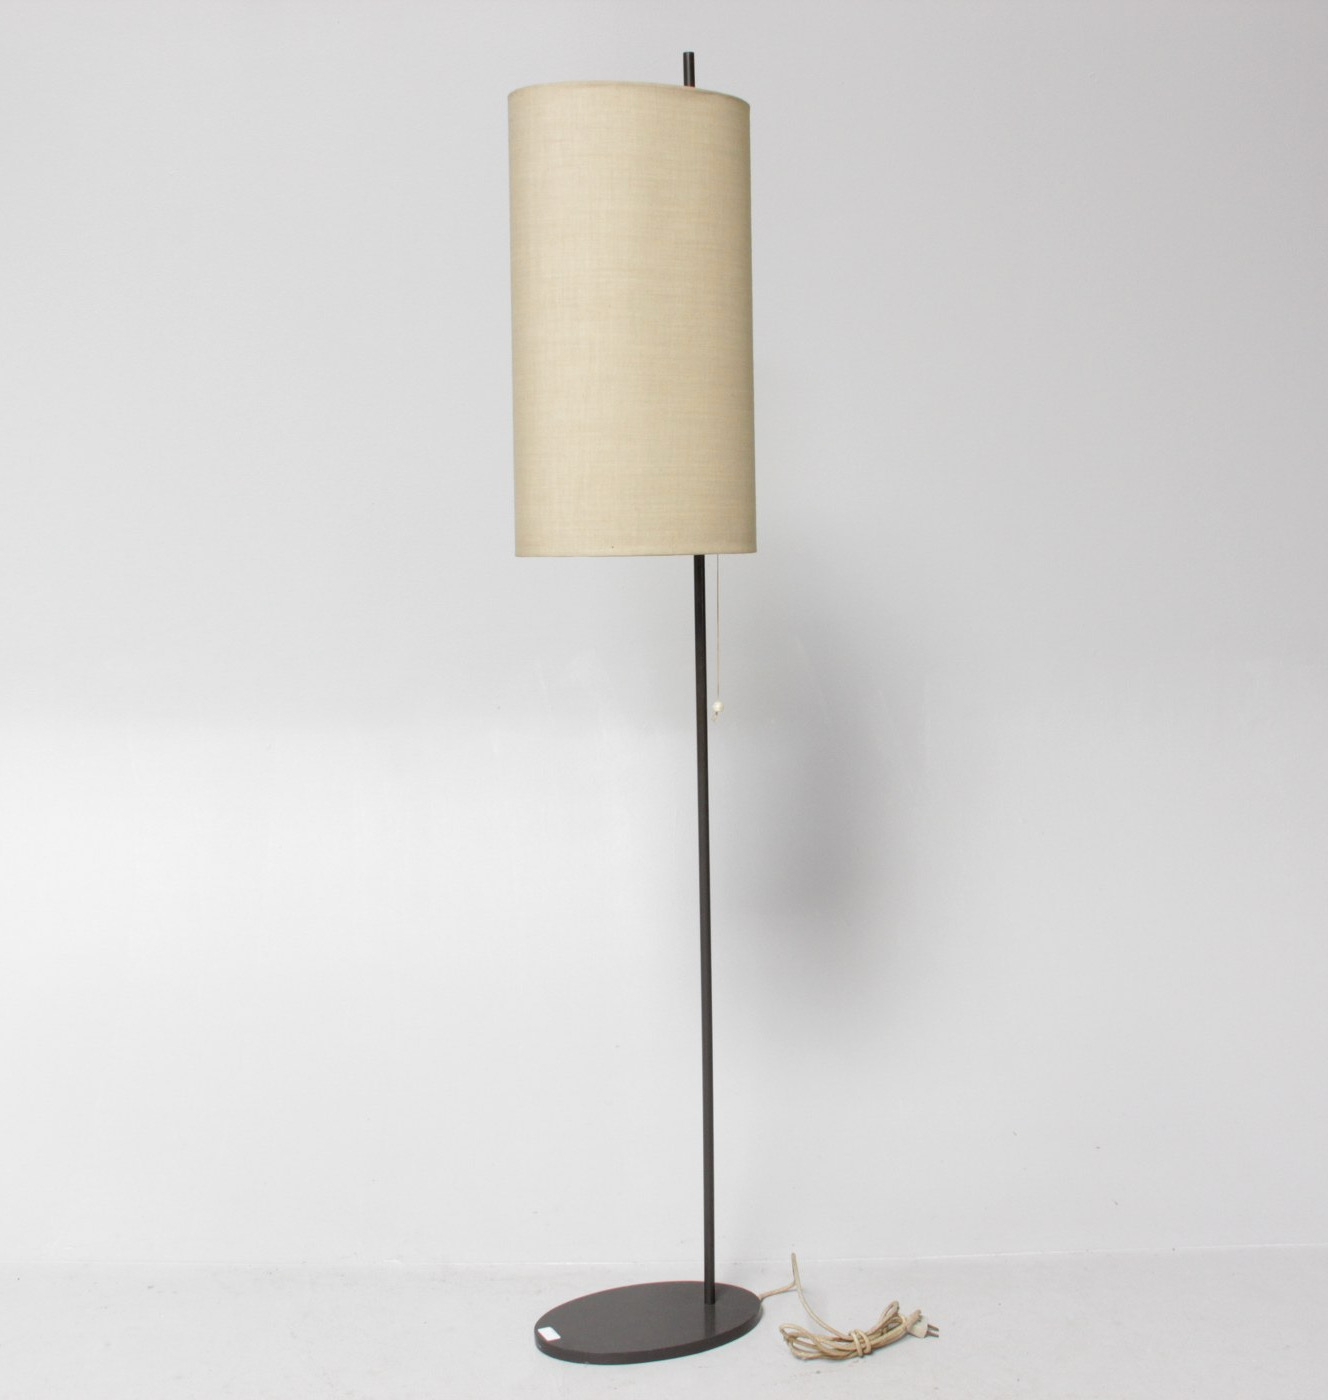 Arne Jacobsen - Royal floor lamp